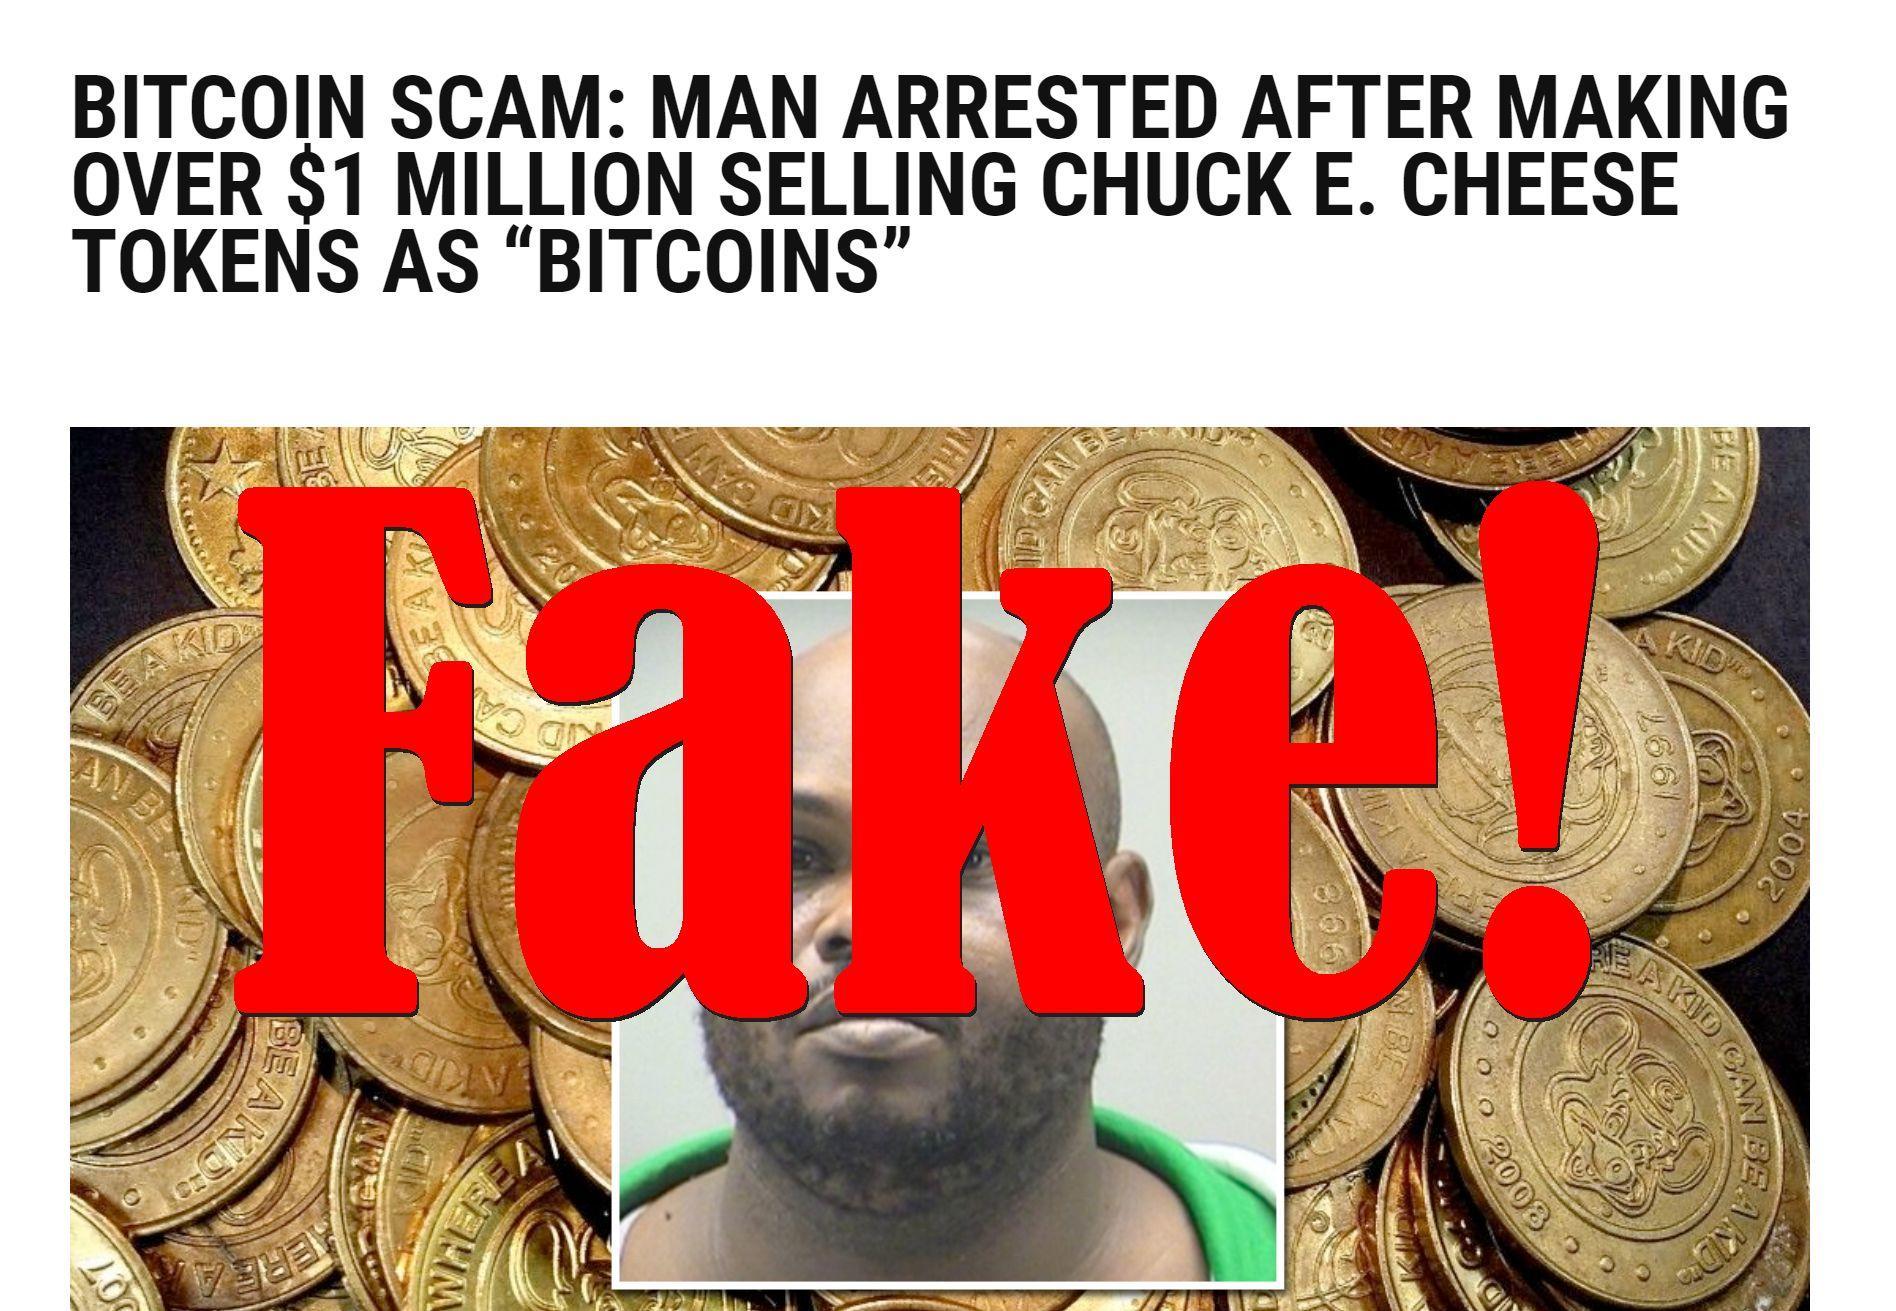 Fake News Man NOT Arrested After Making Over 1 Million Selling